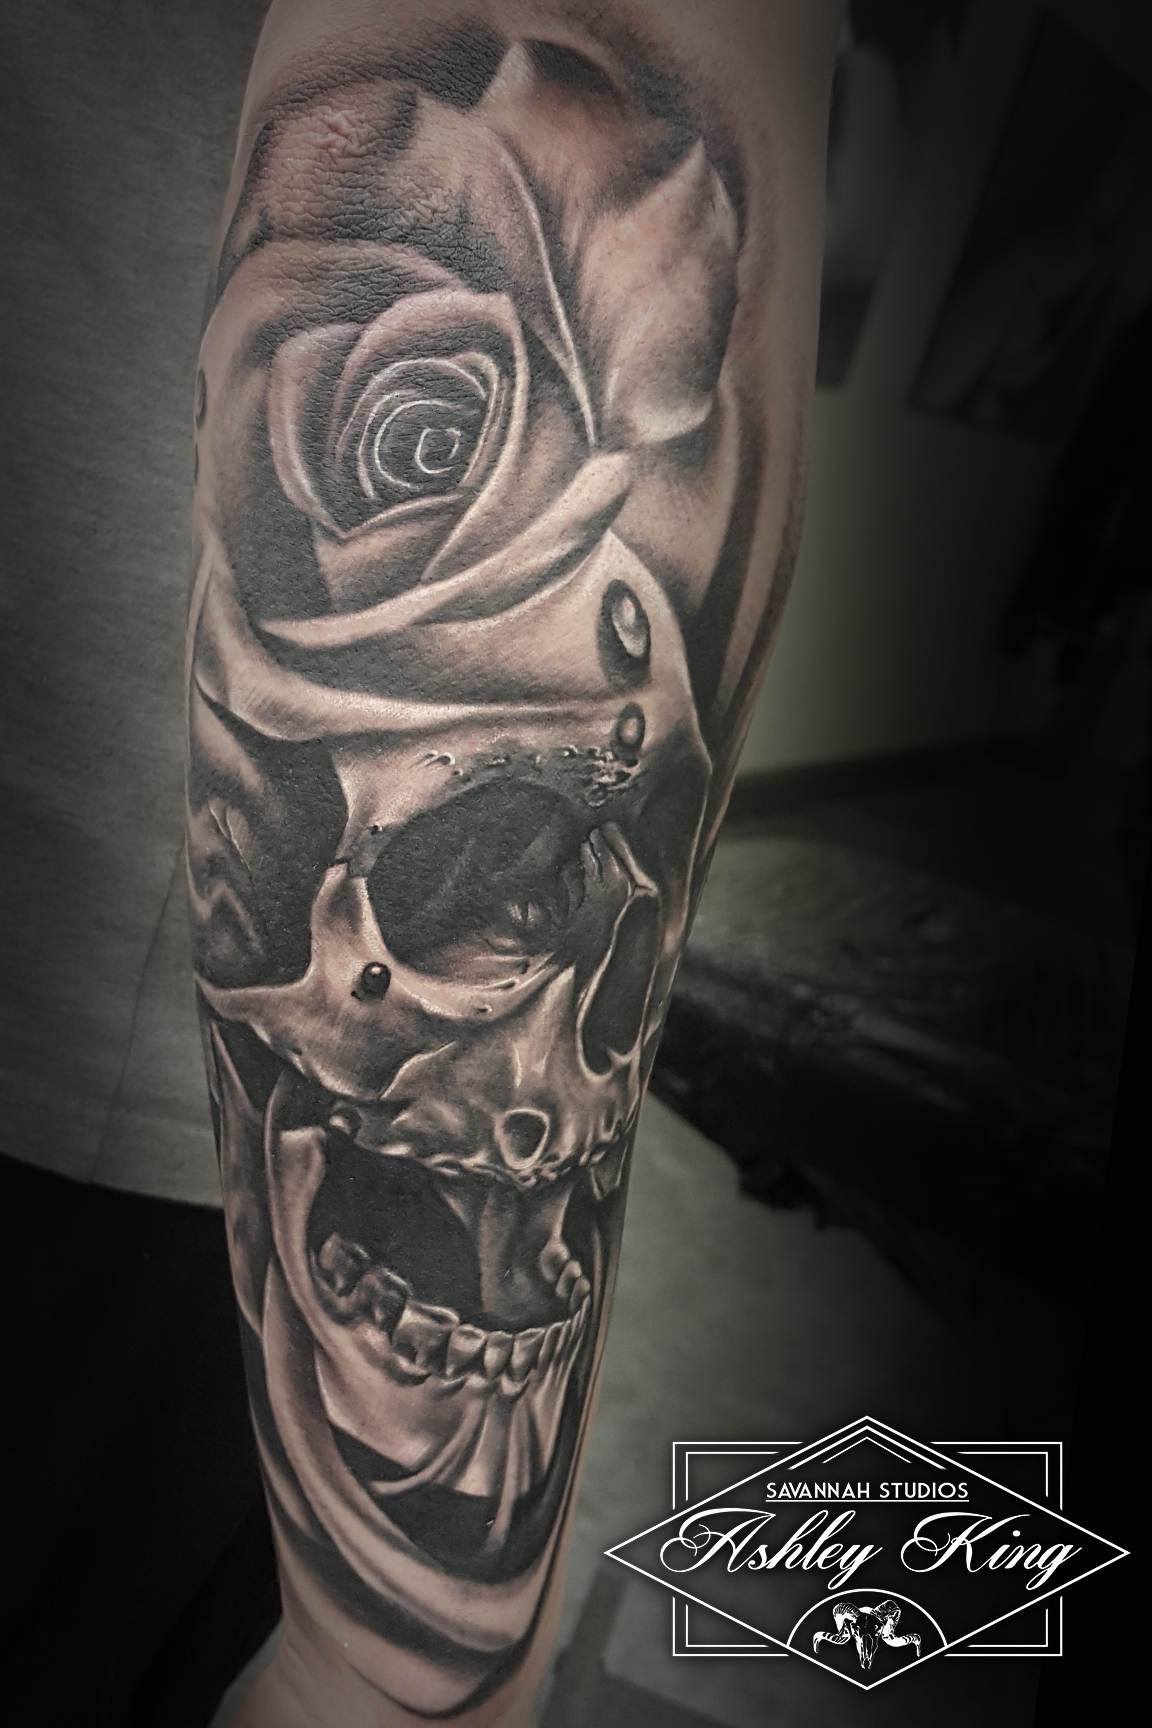 Skull and rose head